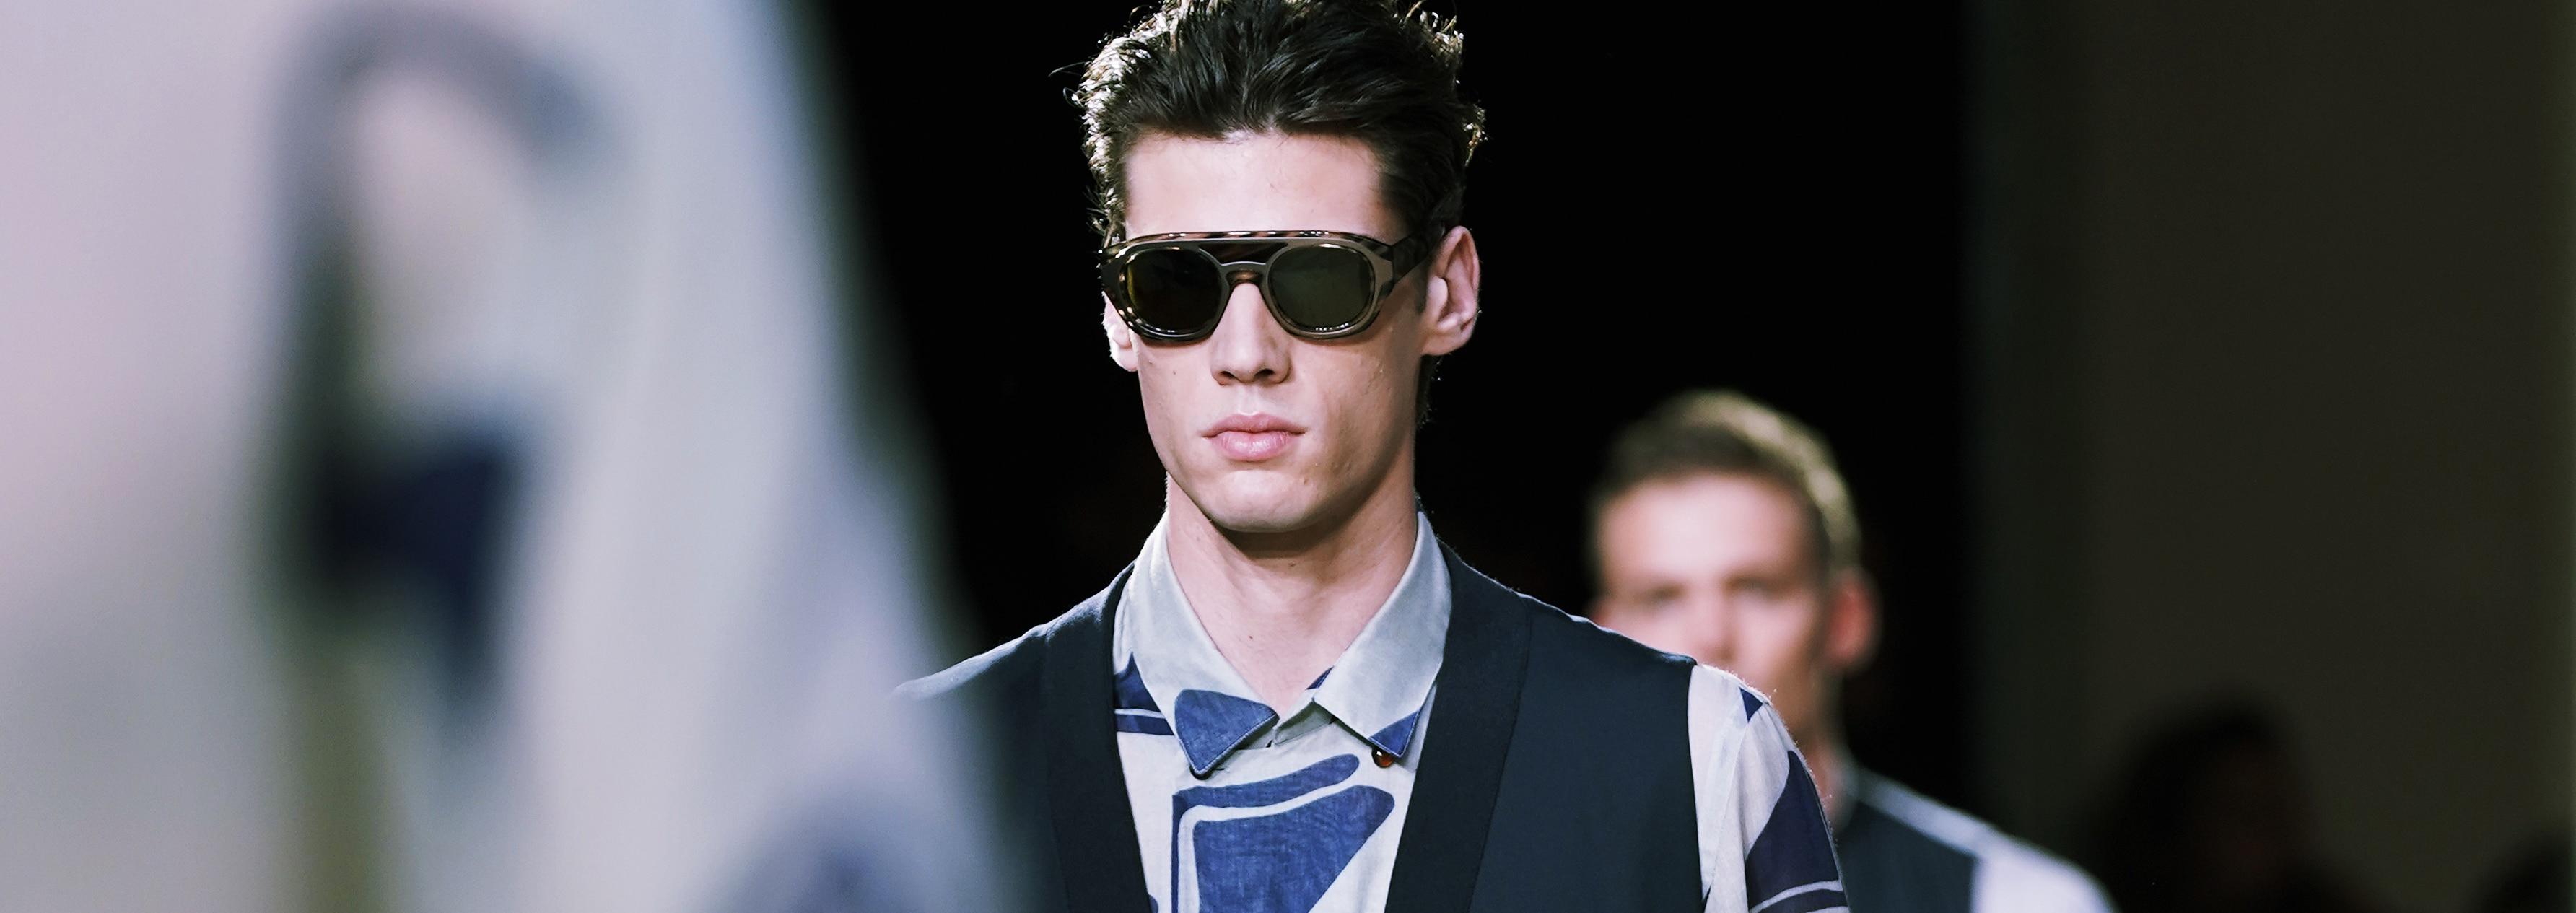 Abbigliamento Uomo Giorgio Armani - Runway - Milan Men's Fashion Week Spring/Summer 2020